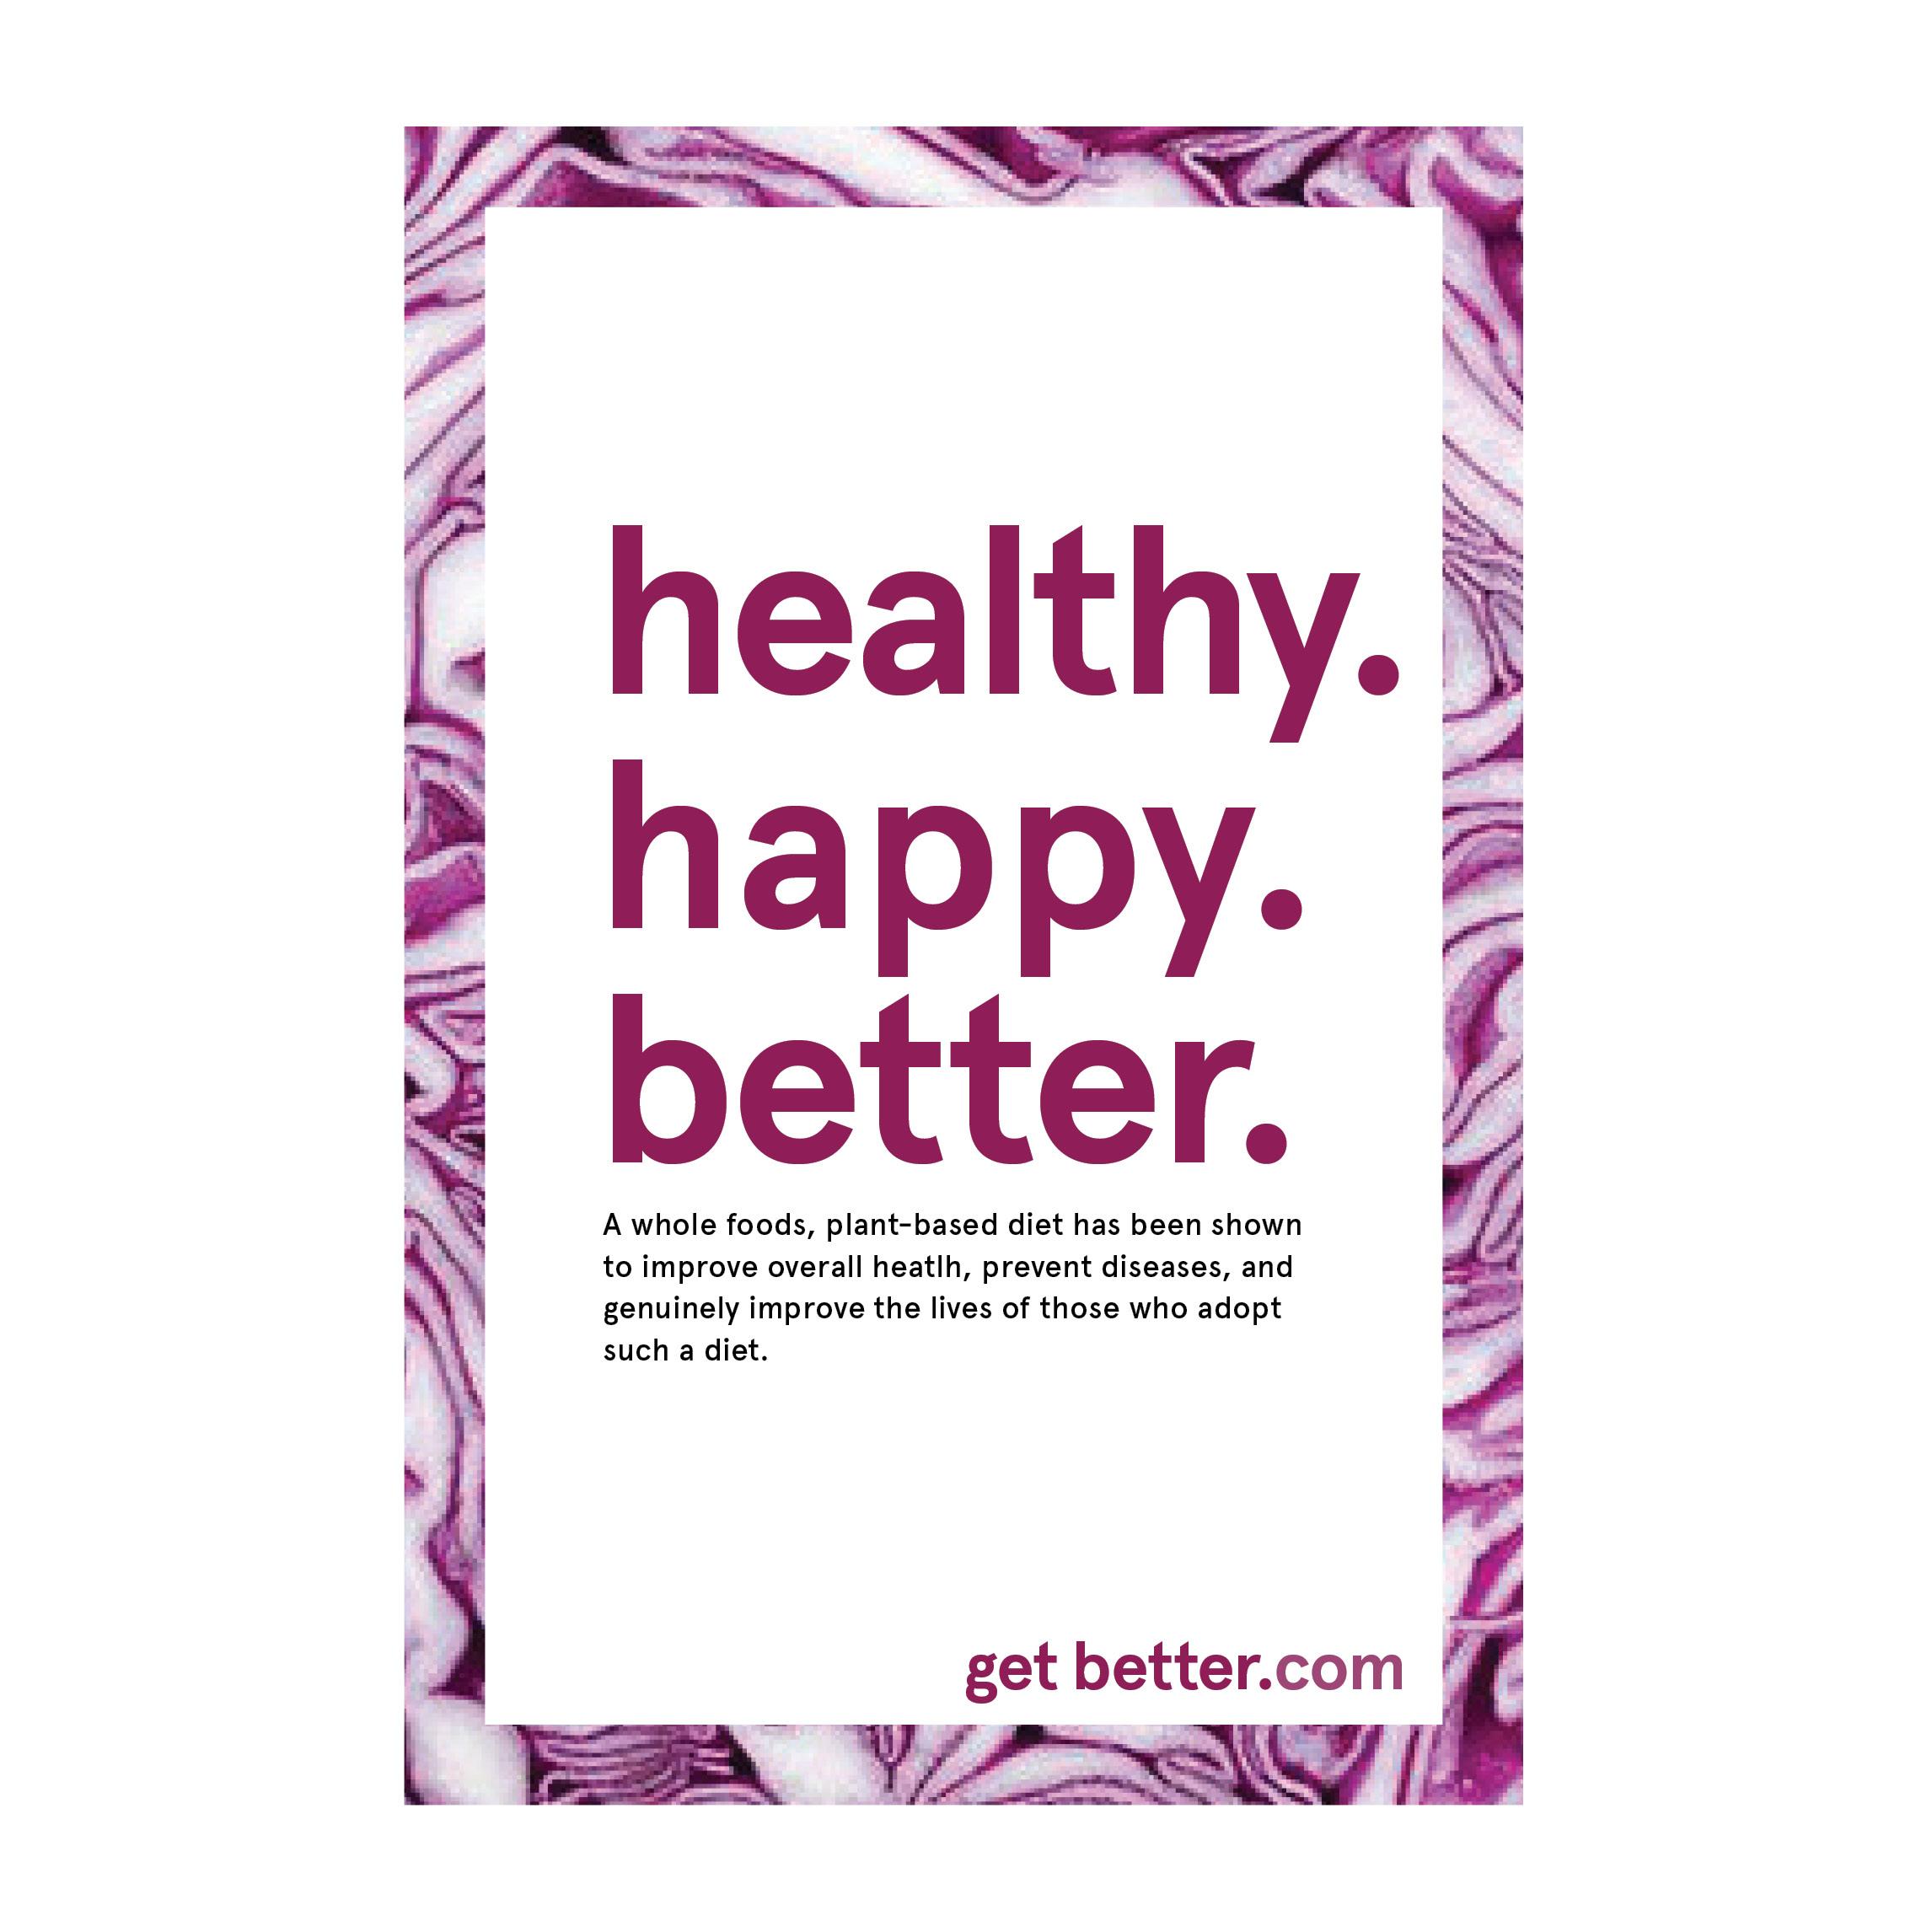 <i>Get Better.</i>